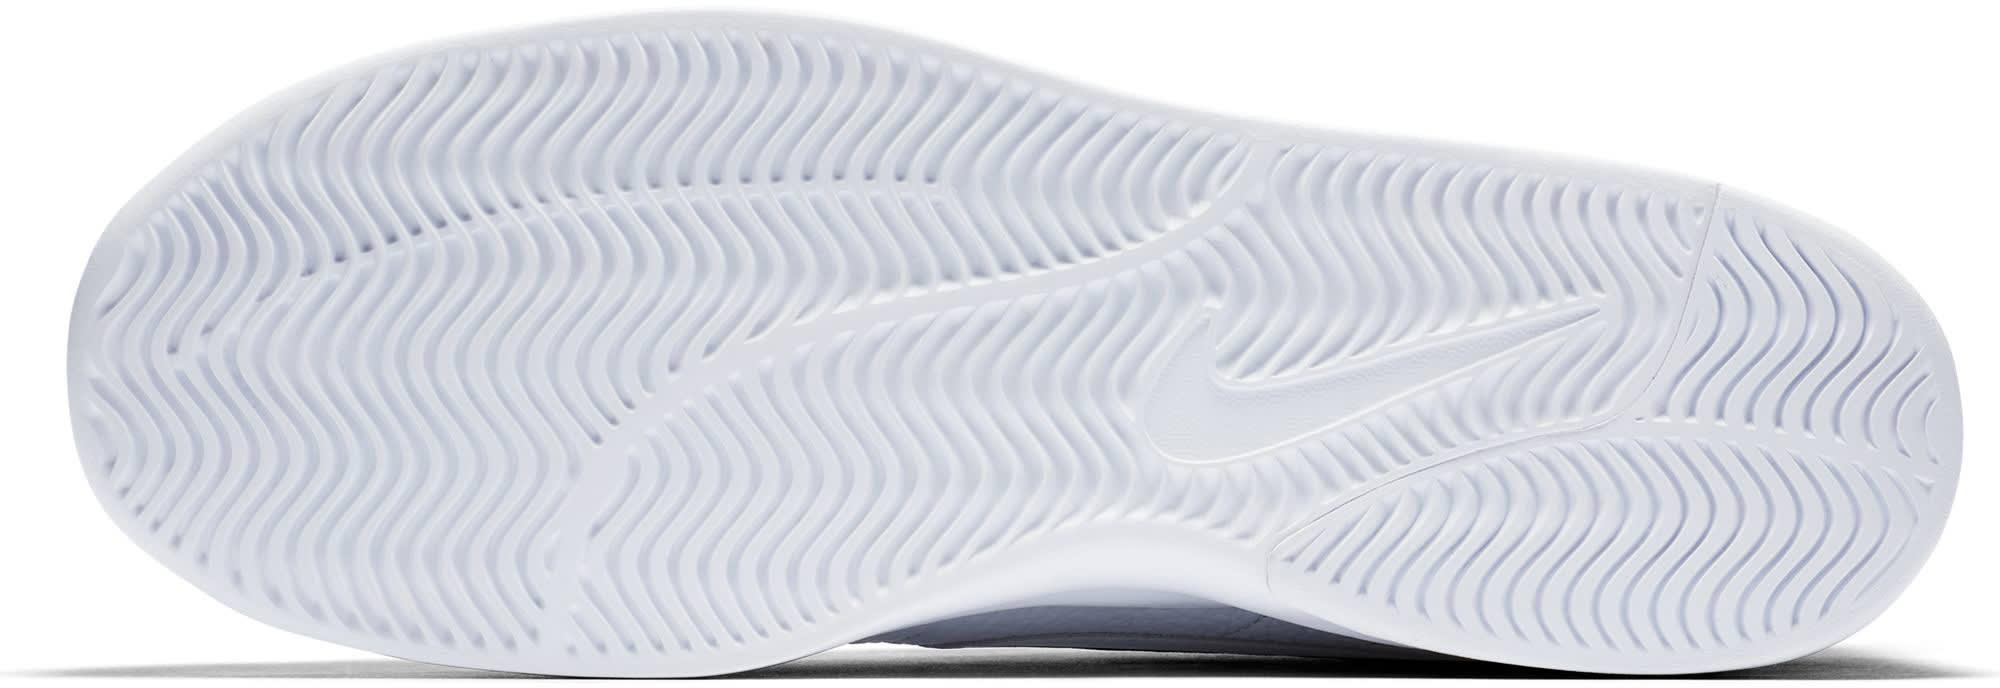 9efcb403d68 Nike SB Air Max Bruin Vapor Leather Skate Shoes - thumbnail 6